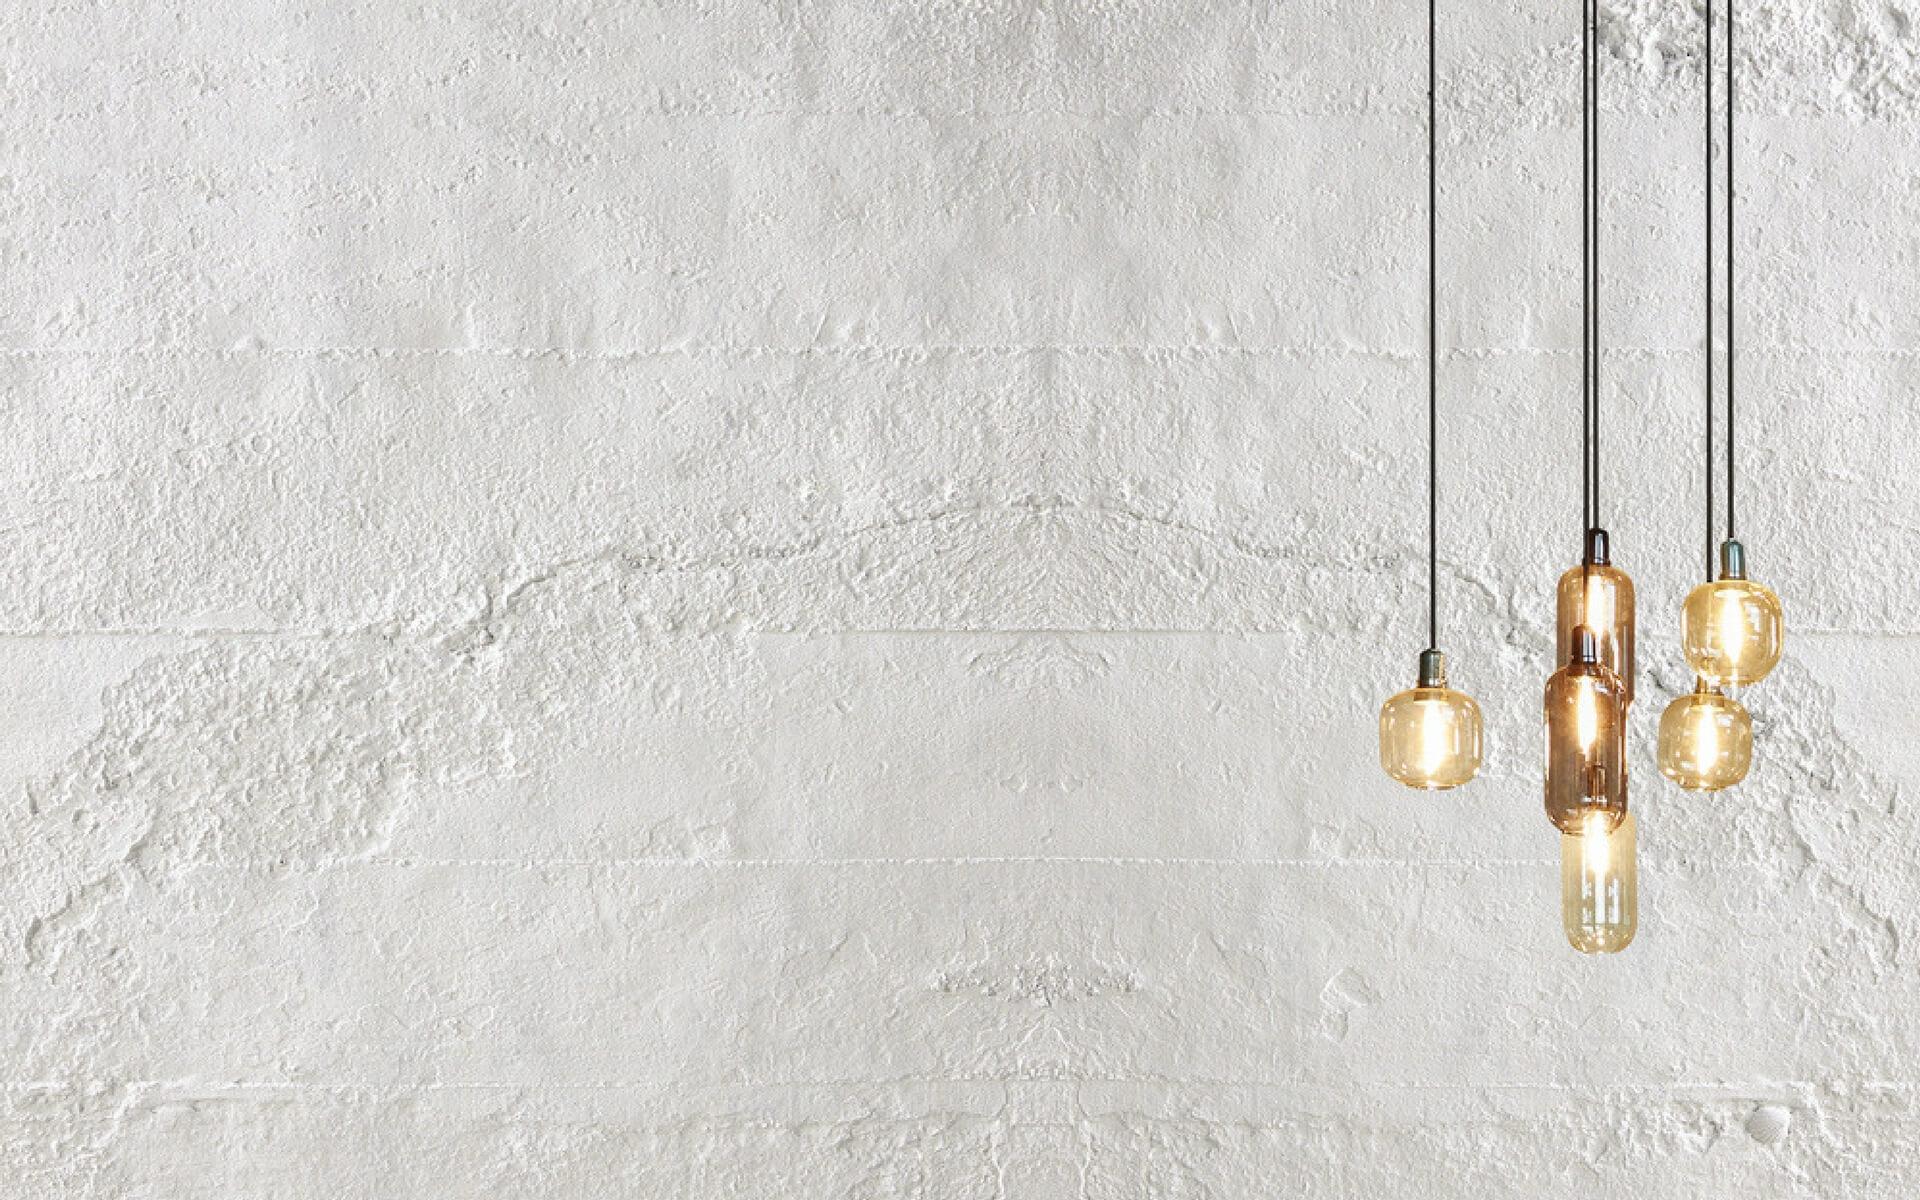 Come Riconoscere I Muri Portanti Blog Oknoplast